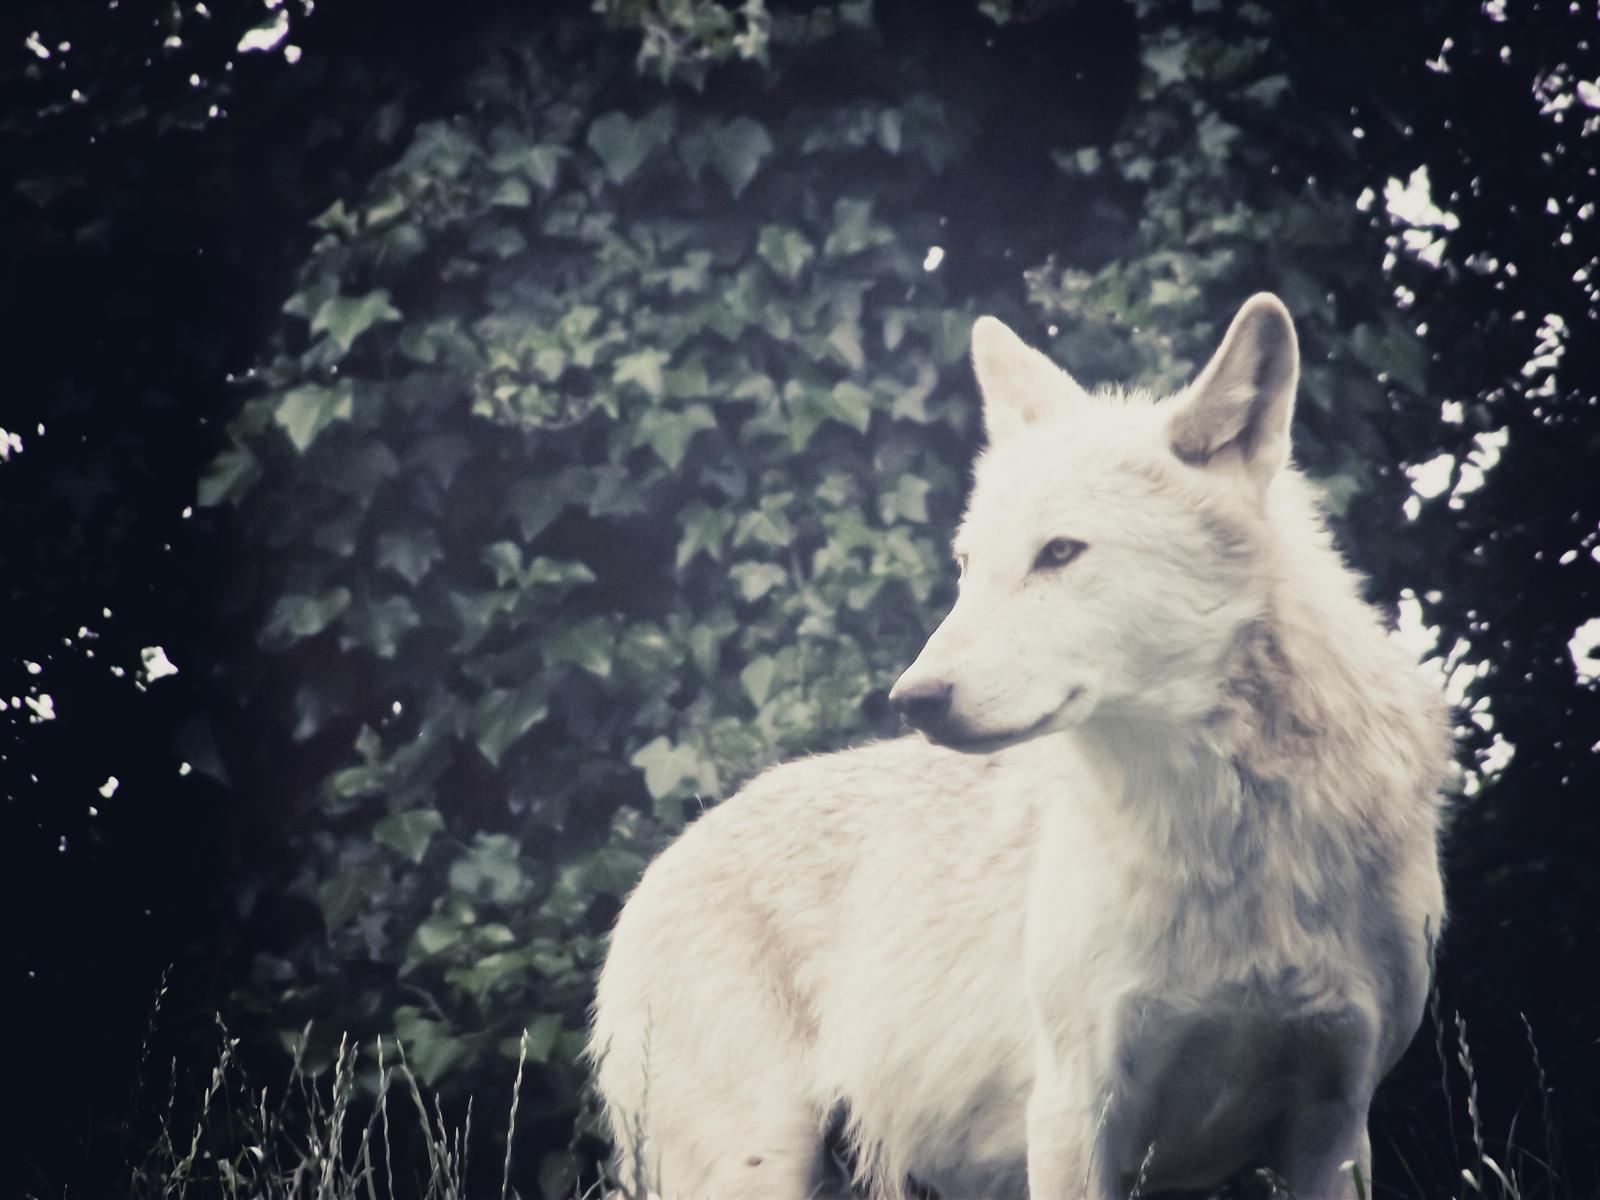 Chloe Epping - Admiradora de Gaia White_wolf_by_n7commander-d3rbg8n